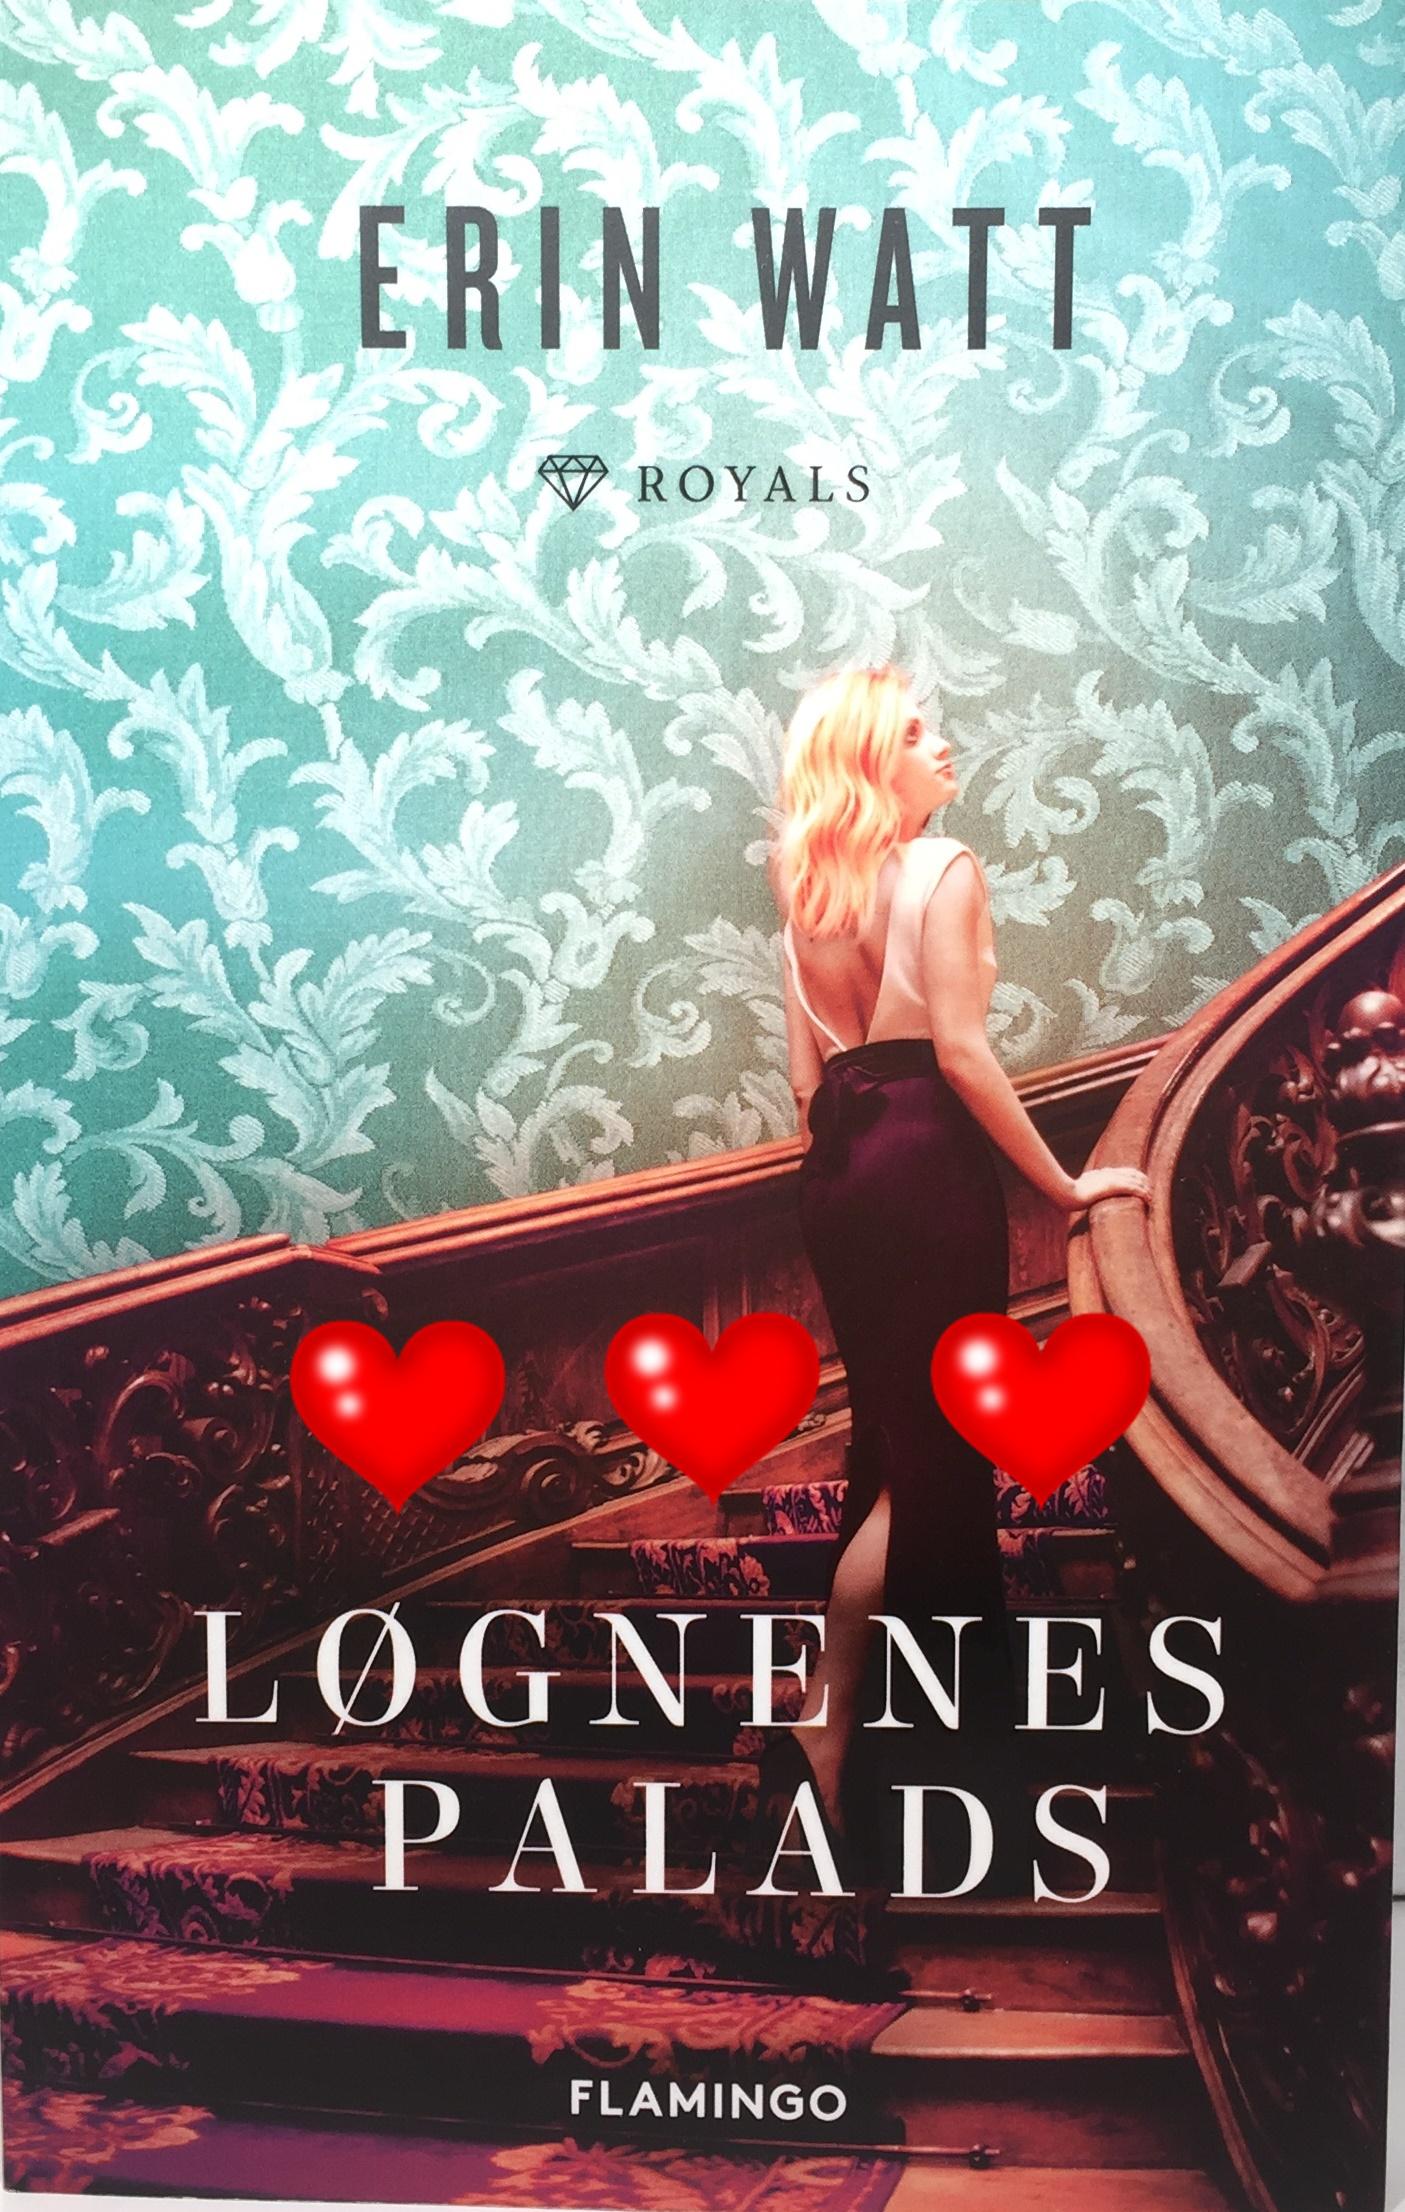 Løgnenes Palads, Flamingo, Flamingo books, Krummeskrummelurer, Anmeldelse, Boganmeldelse, Erin Watt, Papirprinsessen, Askeprinsen, The Royals